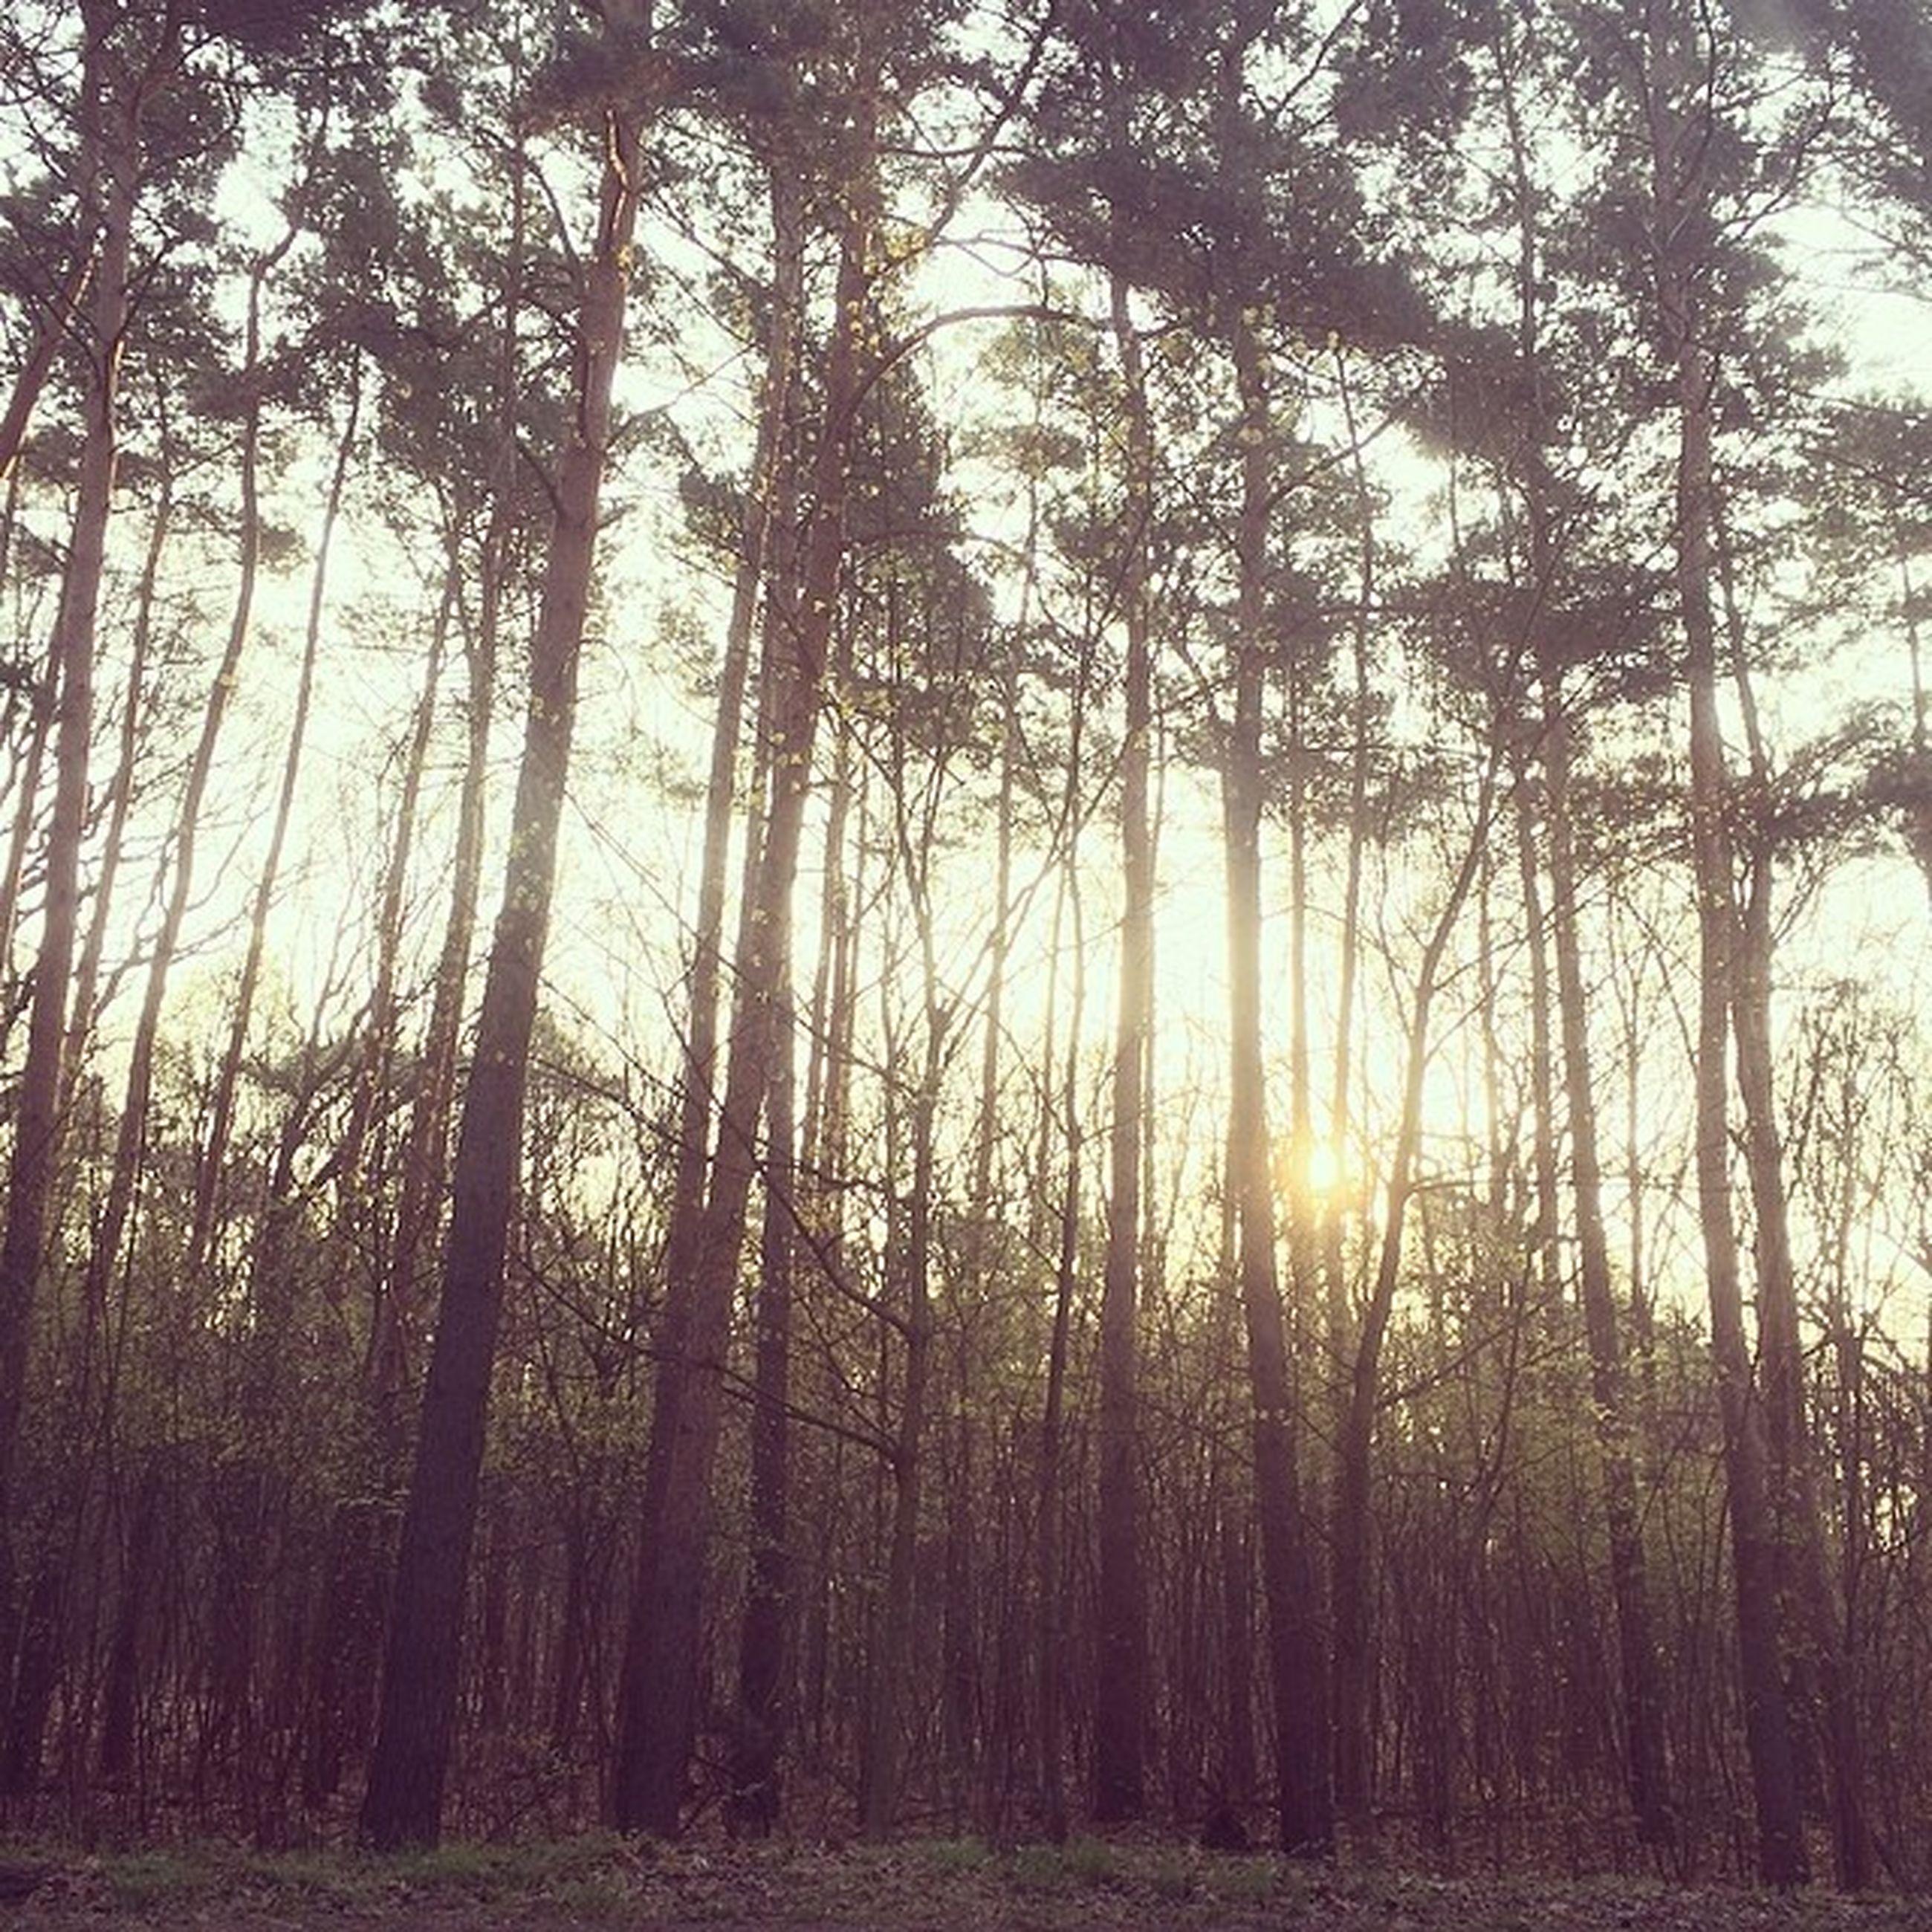 tree, tranquility, tranquil scene, sun, forest, growth, beauty in nature, scenics, nature, sunlight, woodland, tree trunk, sunbeam, sunset, non-urban scene, sky, idyllic, branch, landscape, lens flare